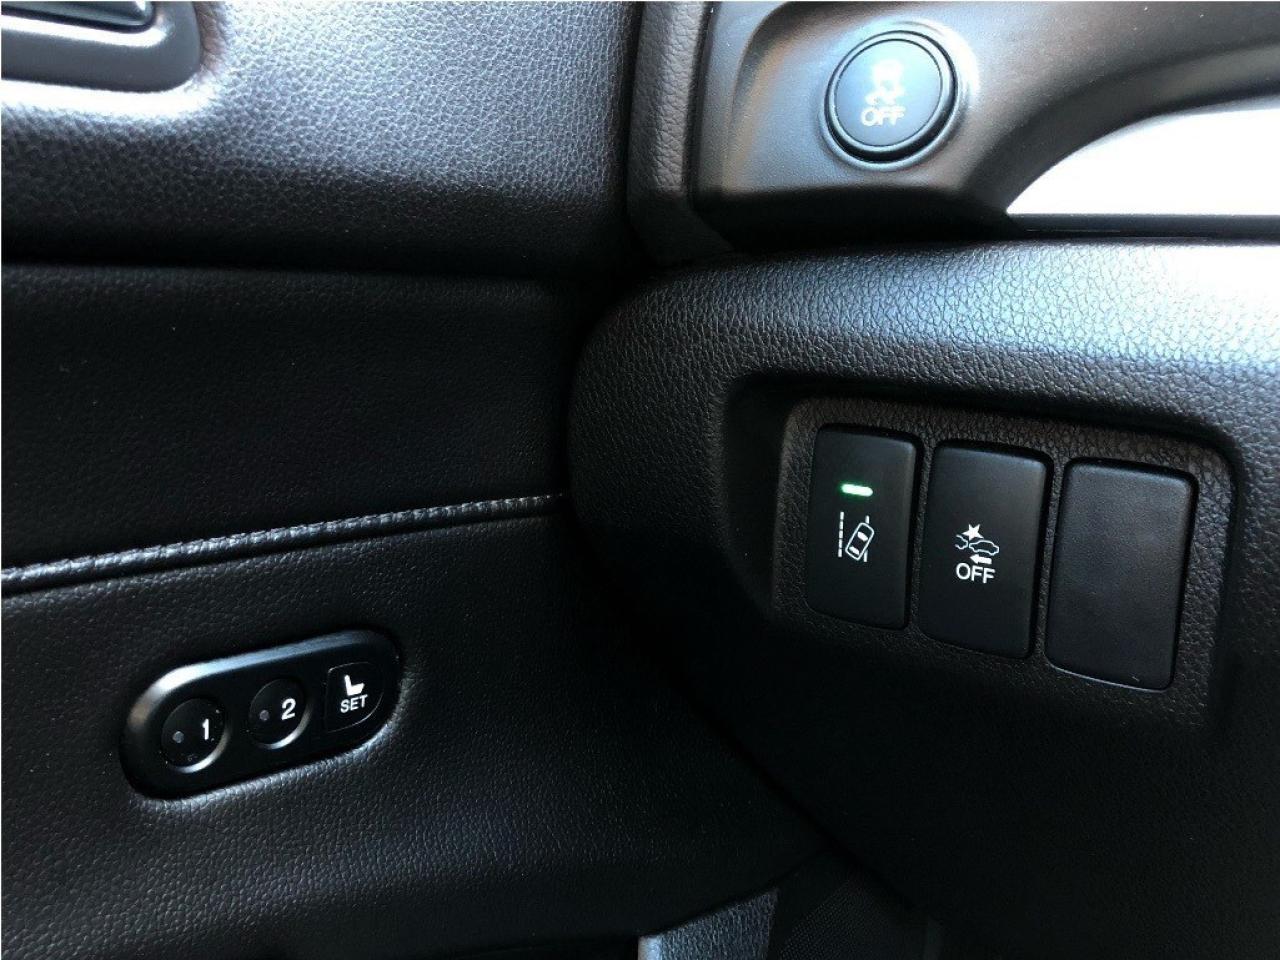 2017 Acura ILX Premium Pkg - Leather - Sunroof - Rear Camera